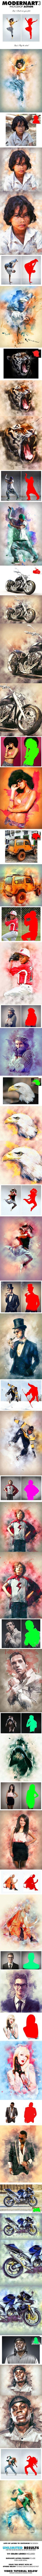 ModernArt 3 Photoshop Action #photoeffect Download: http://graphicriver.net/item/modernart-3-photoshop-action/10936886?ref=ksioks